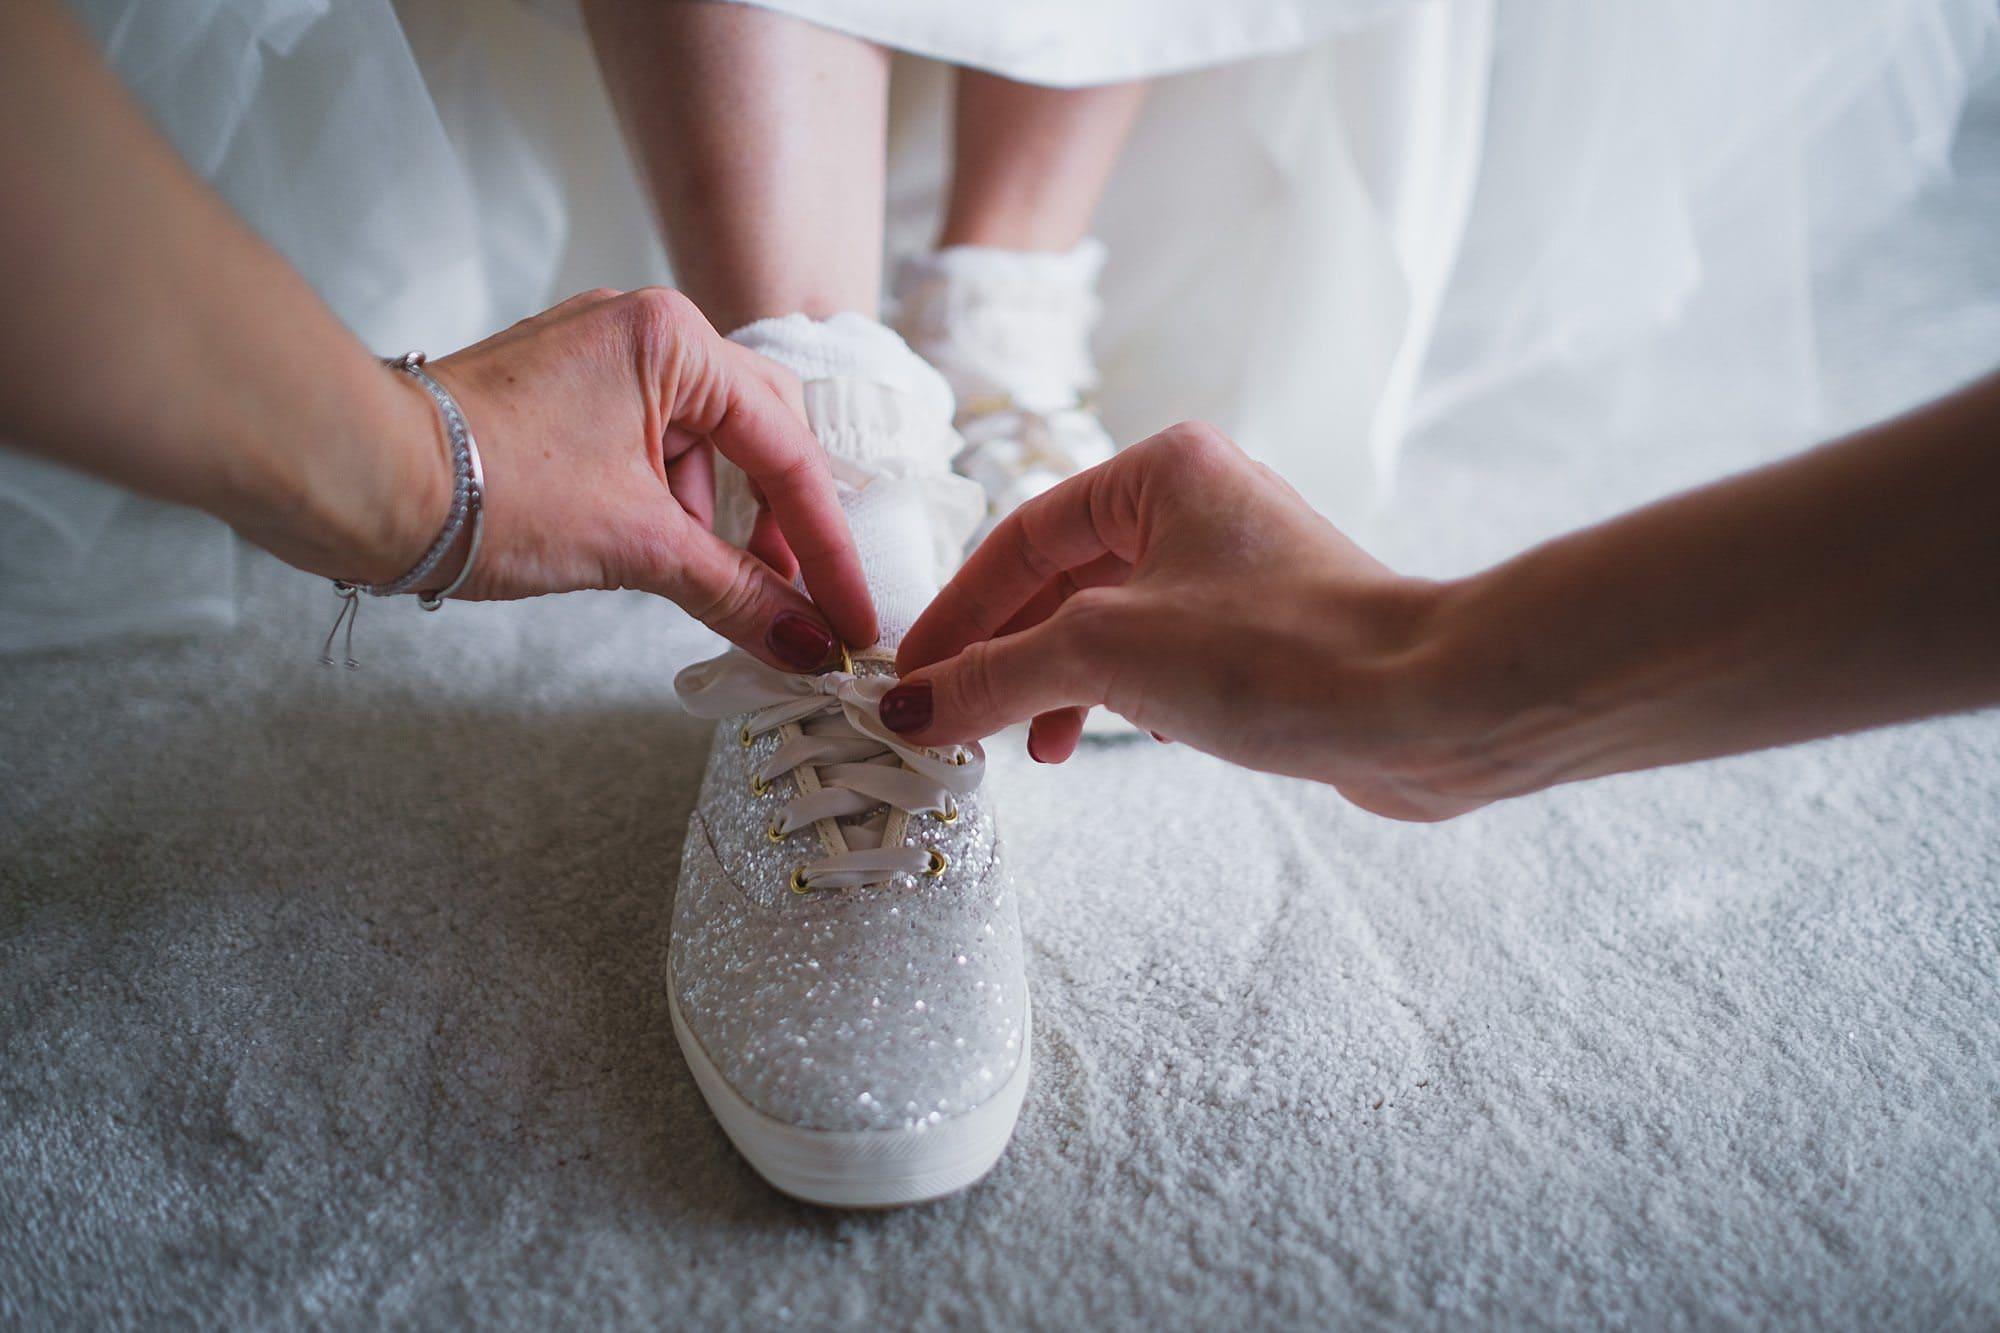 keds wedding shoes for a fulham palace wedding